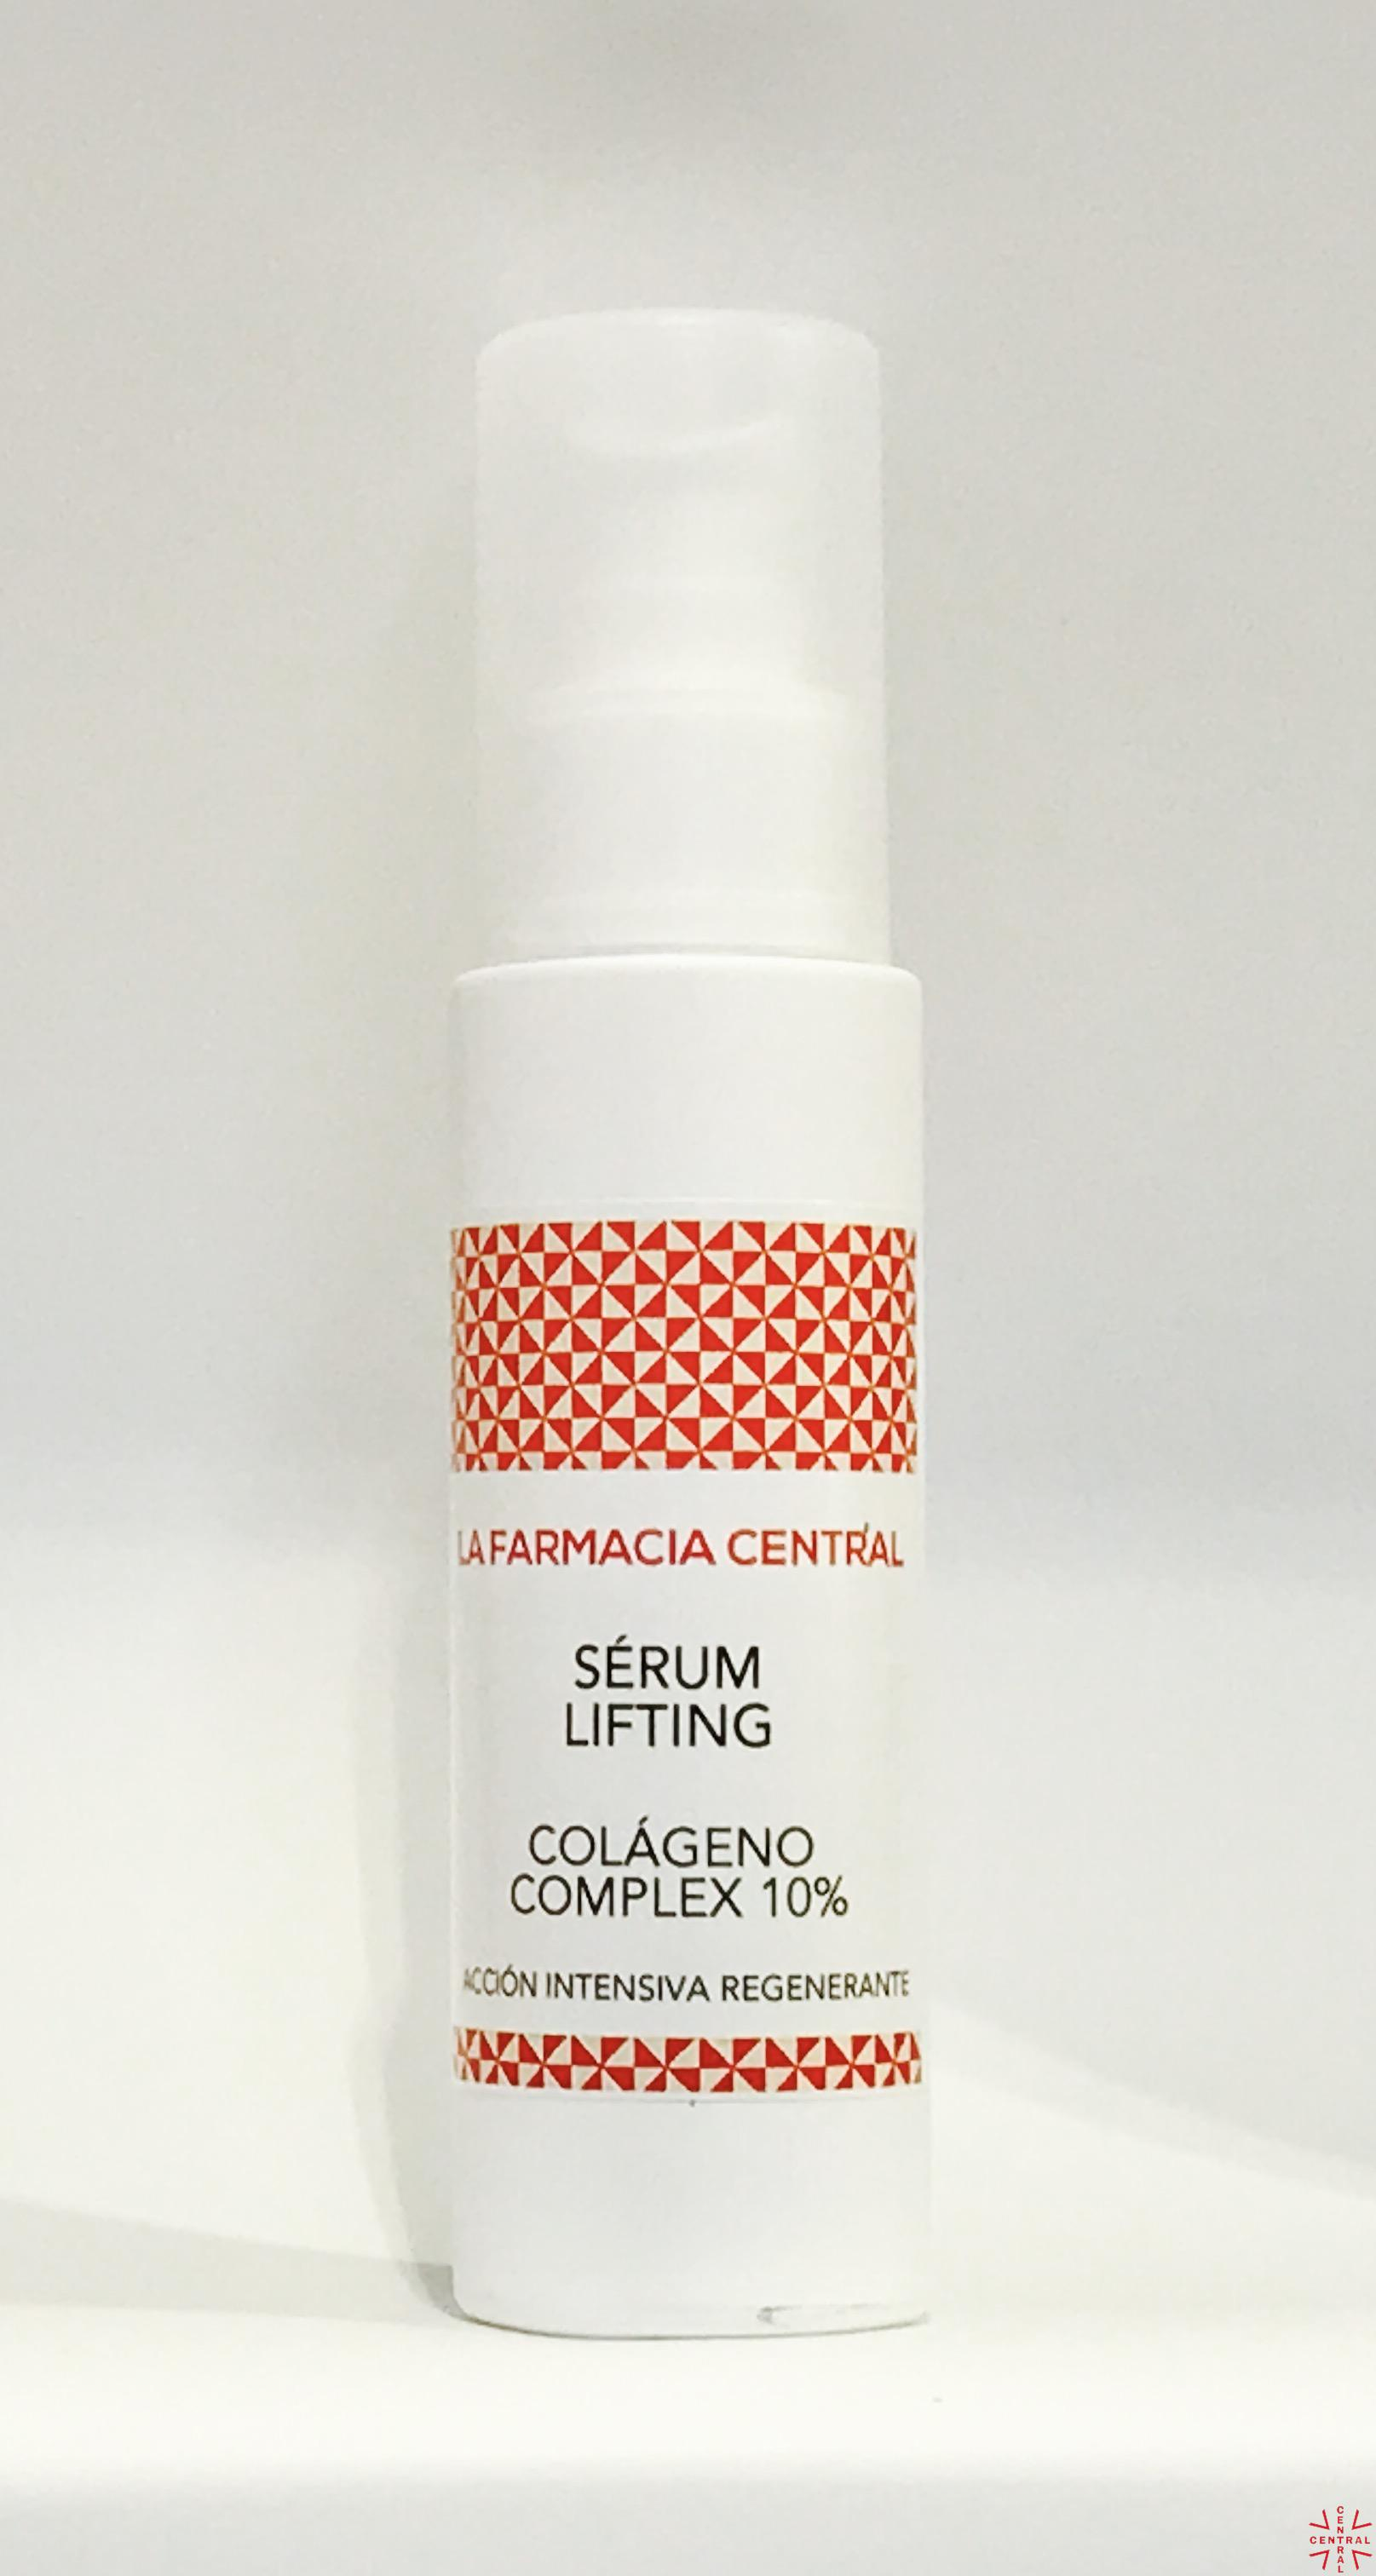 LFC Sérum lifting colágeno complex 10%